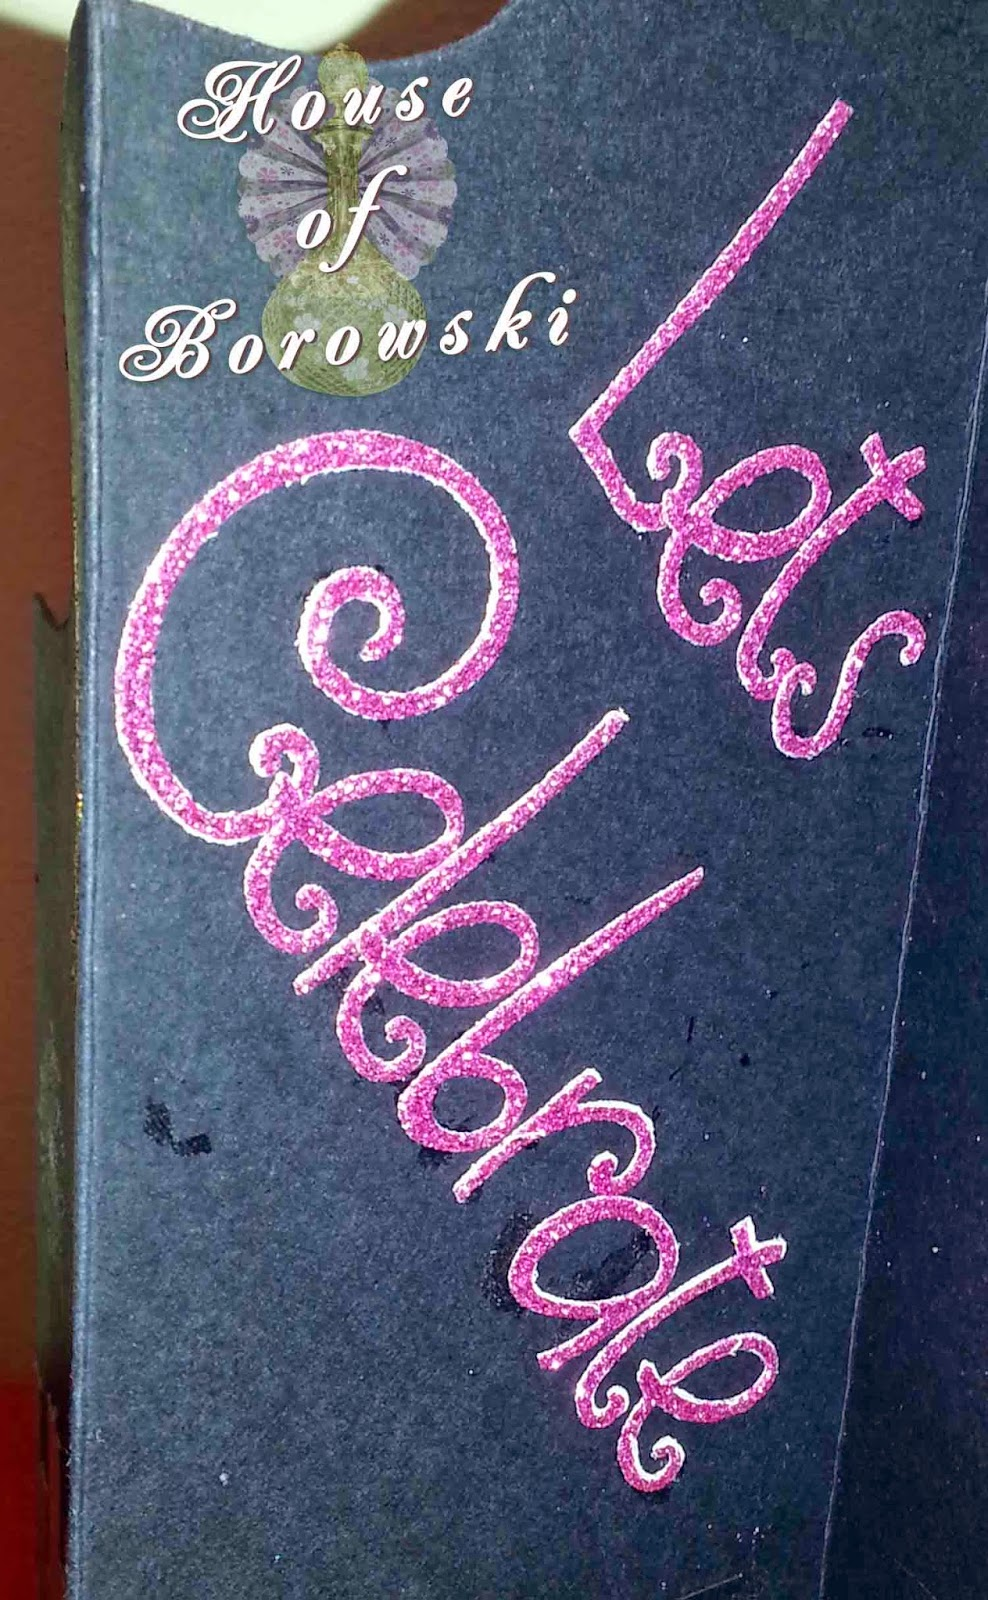 House of Borowski,memory box cityscape silhouette, Cuttlebug, allison ellis design, judikins, Gina K Design Stamp, DCWR,